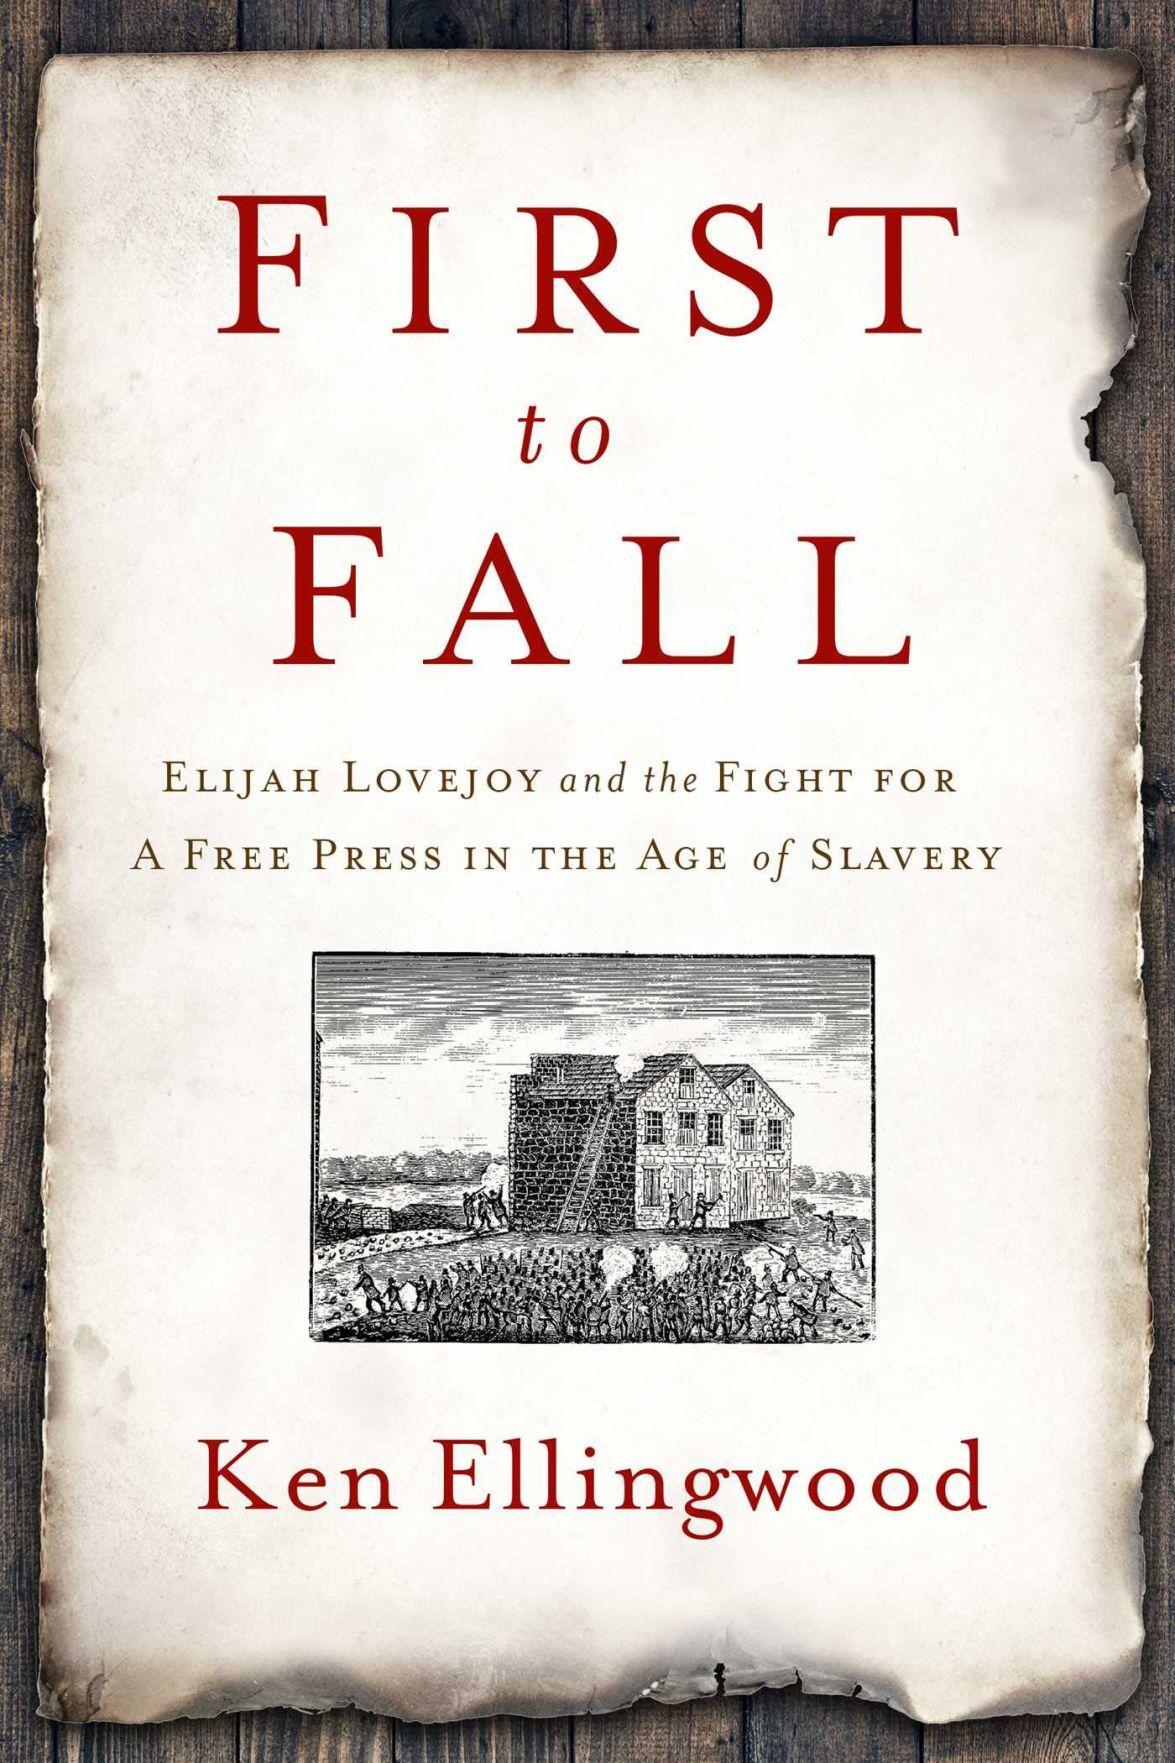 'First to Fall' by Ken Ellingwood